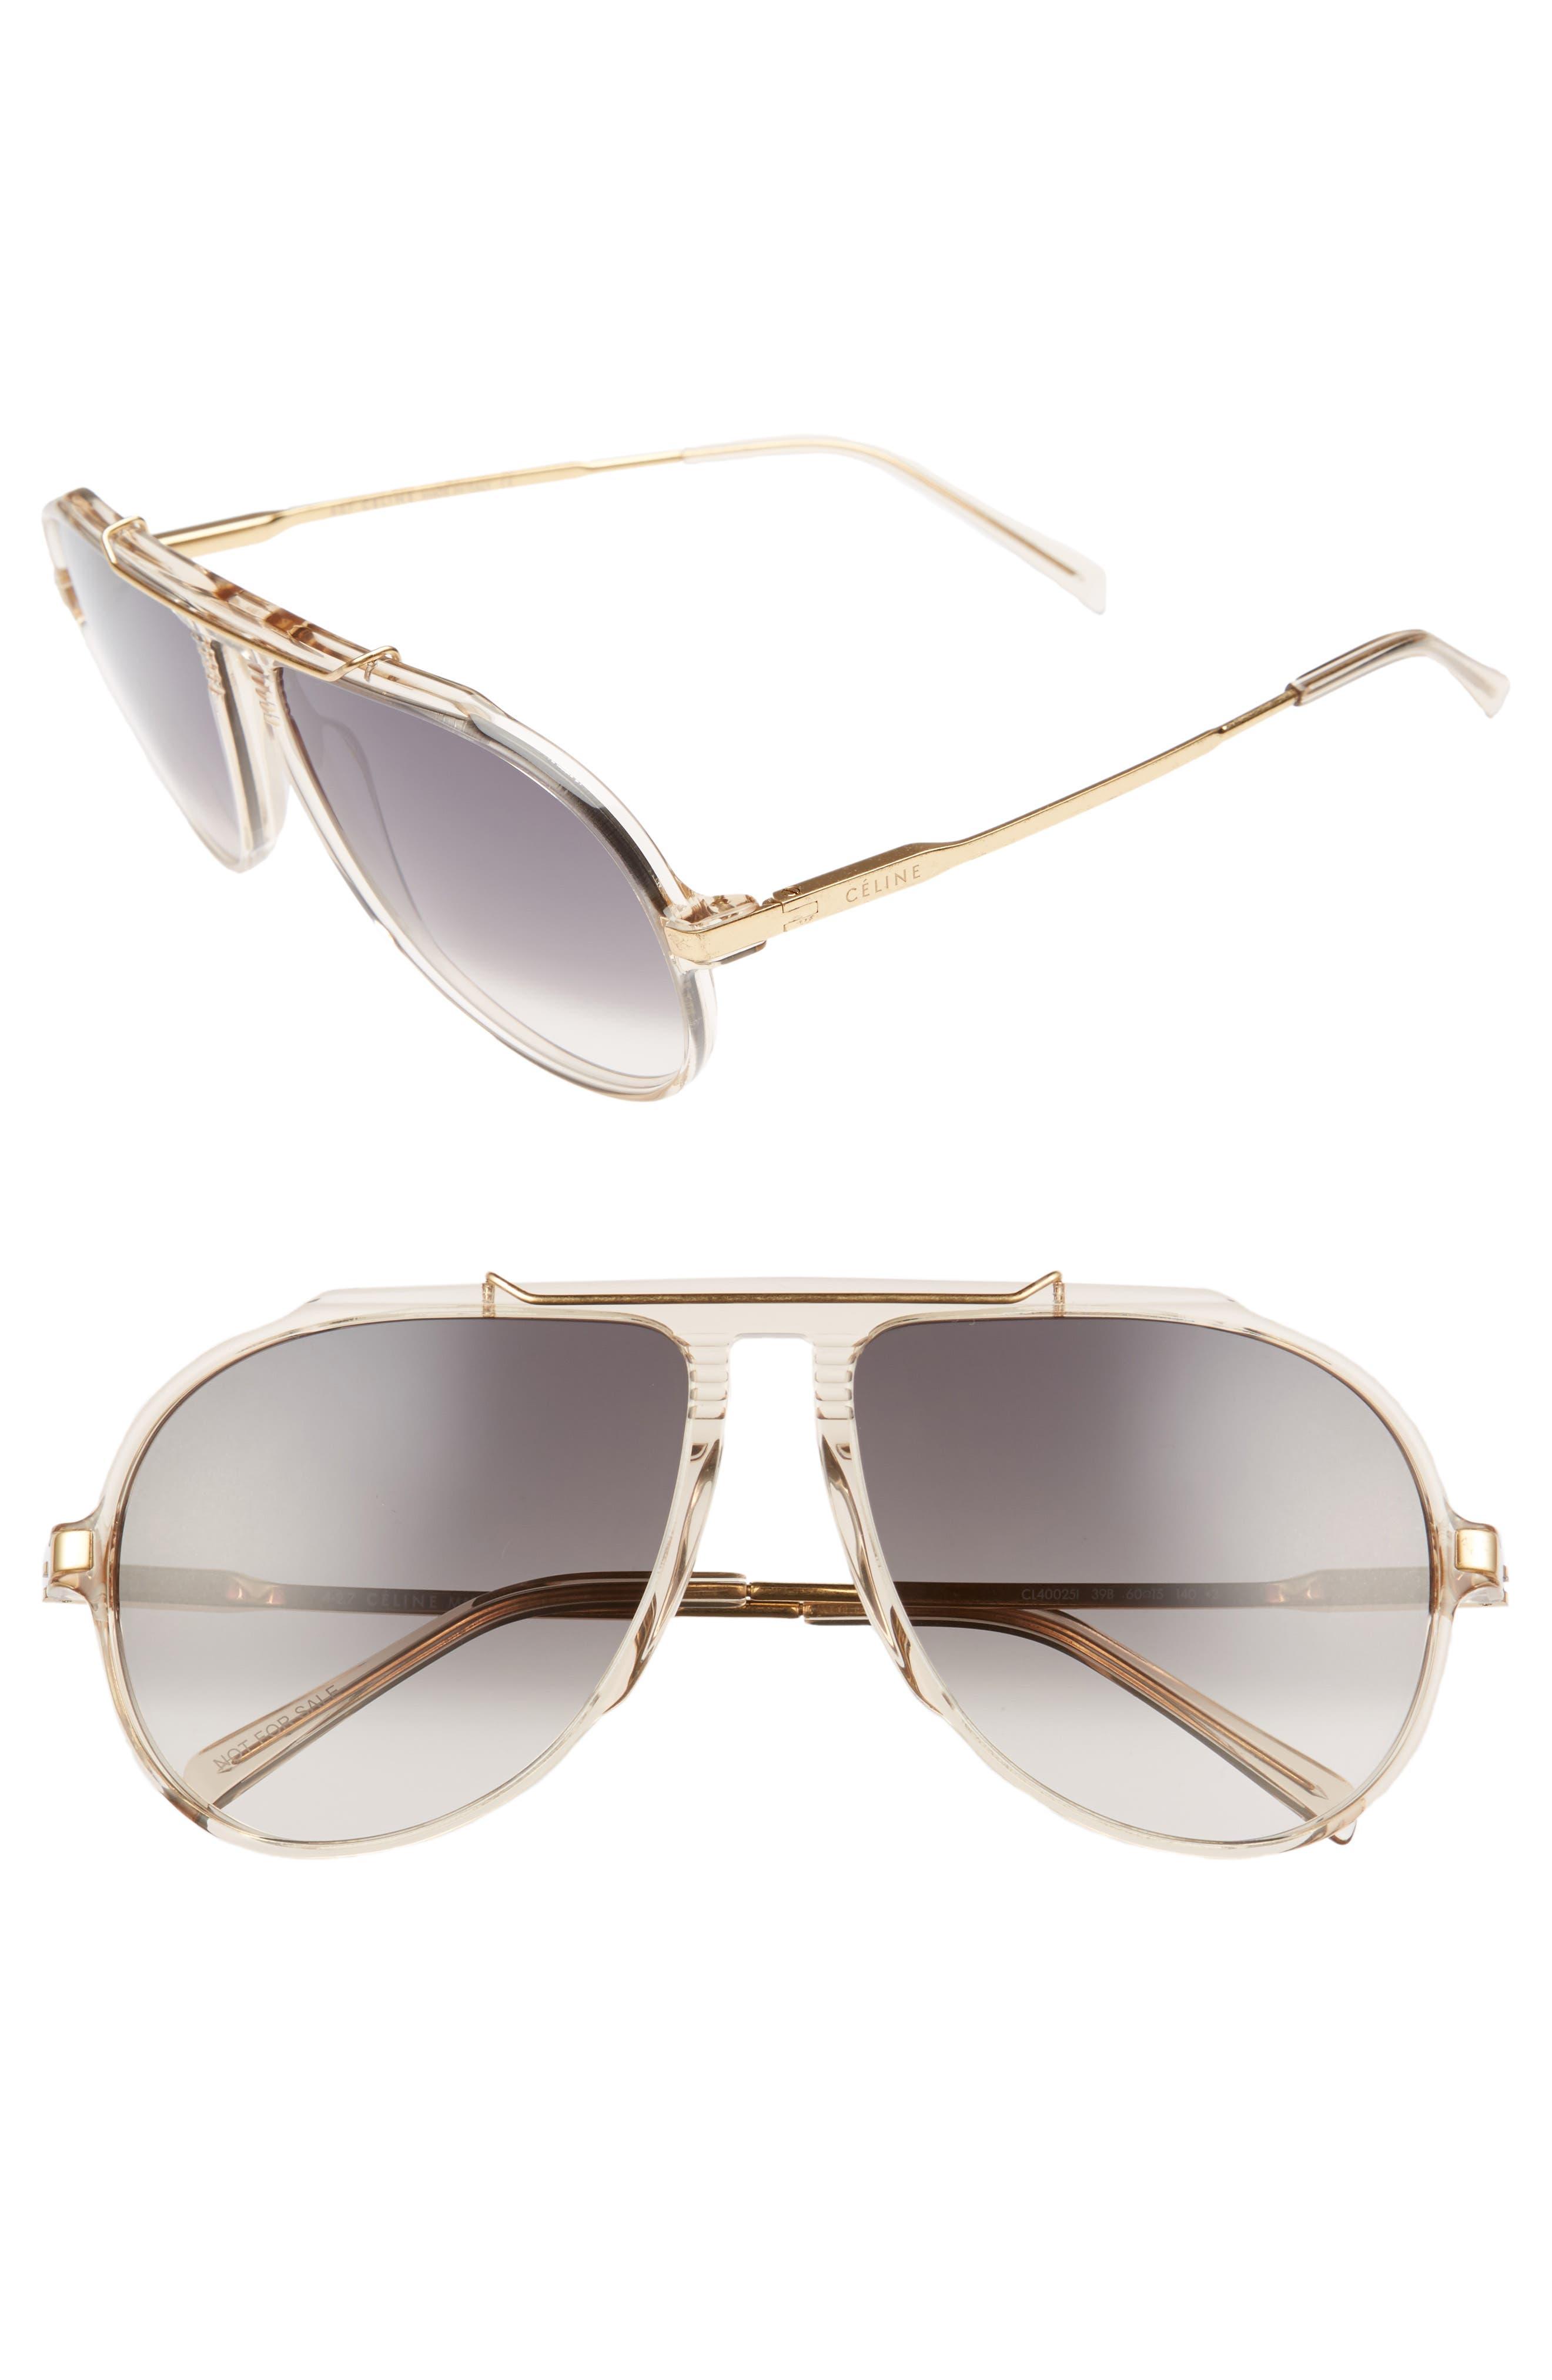 Céline 60mm Gradient Aviator Sunglasses